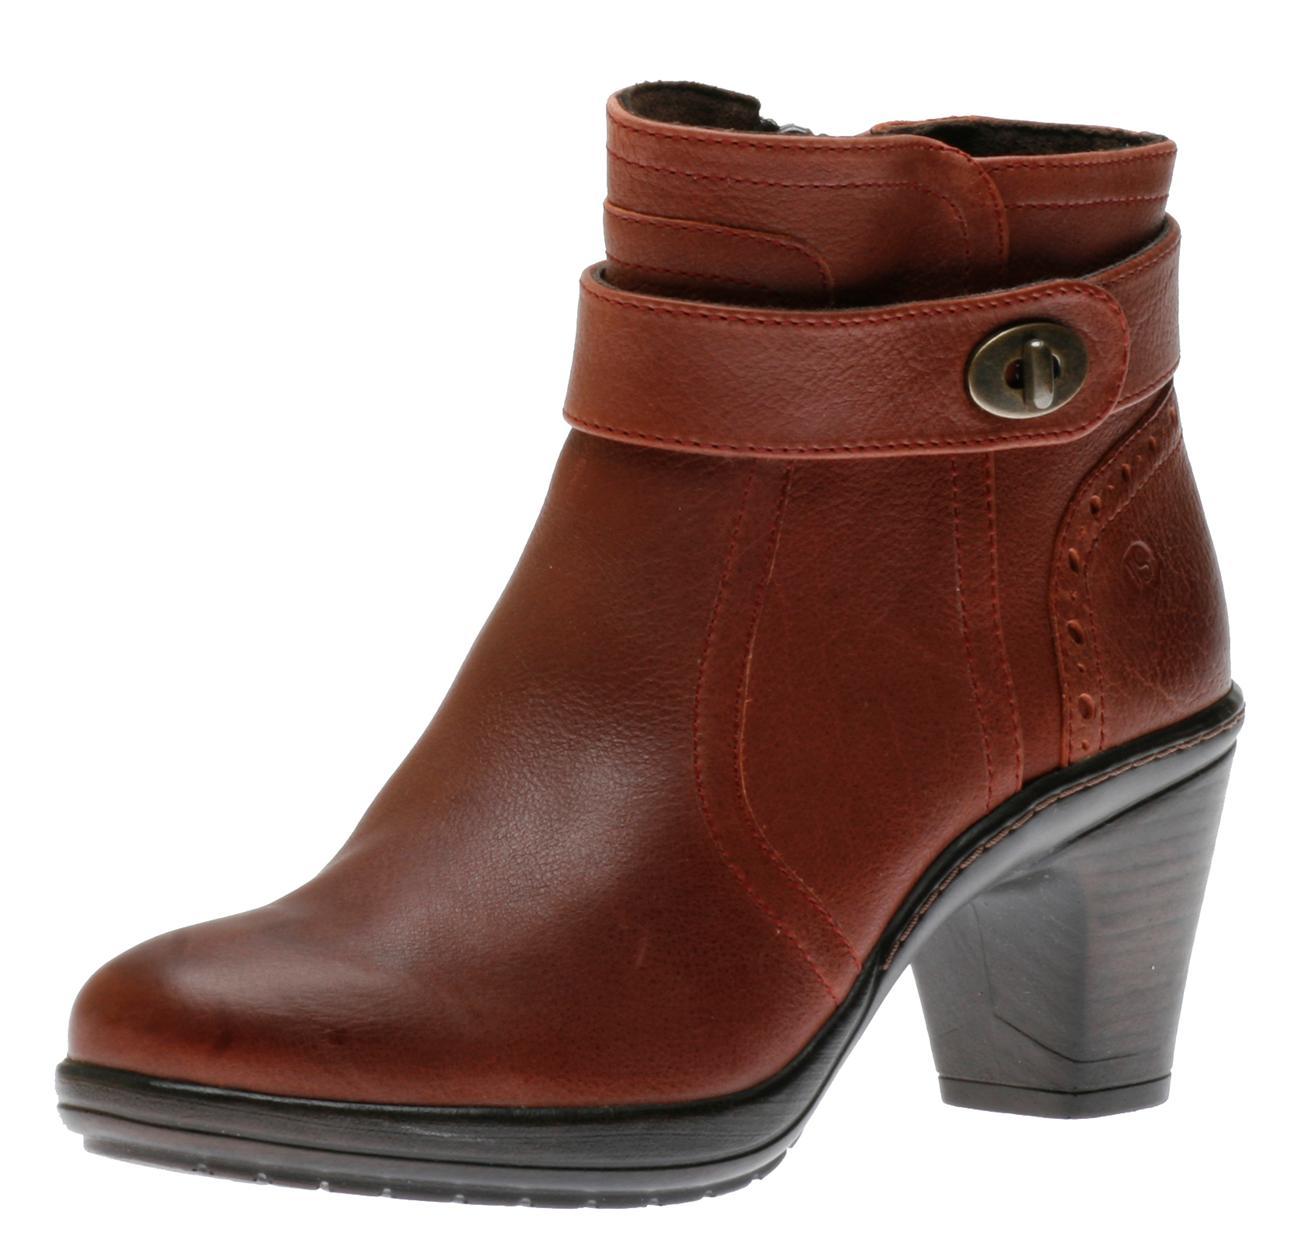 Sas Shoes Toronto Locations